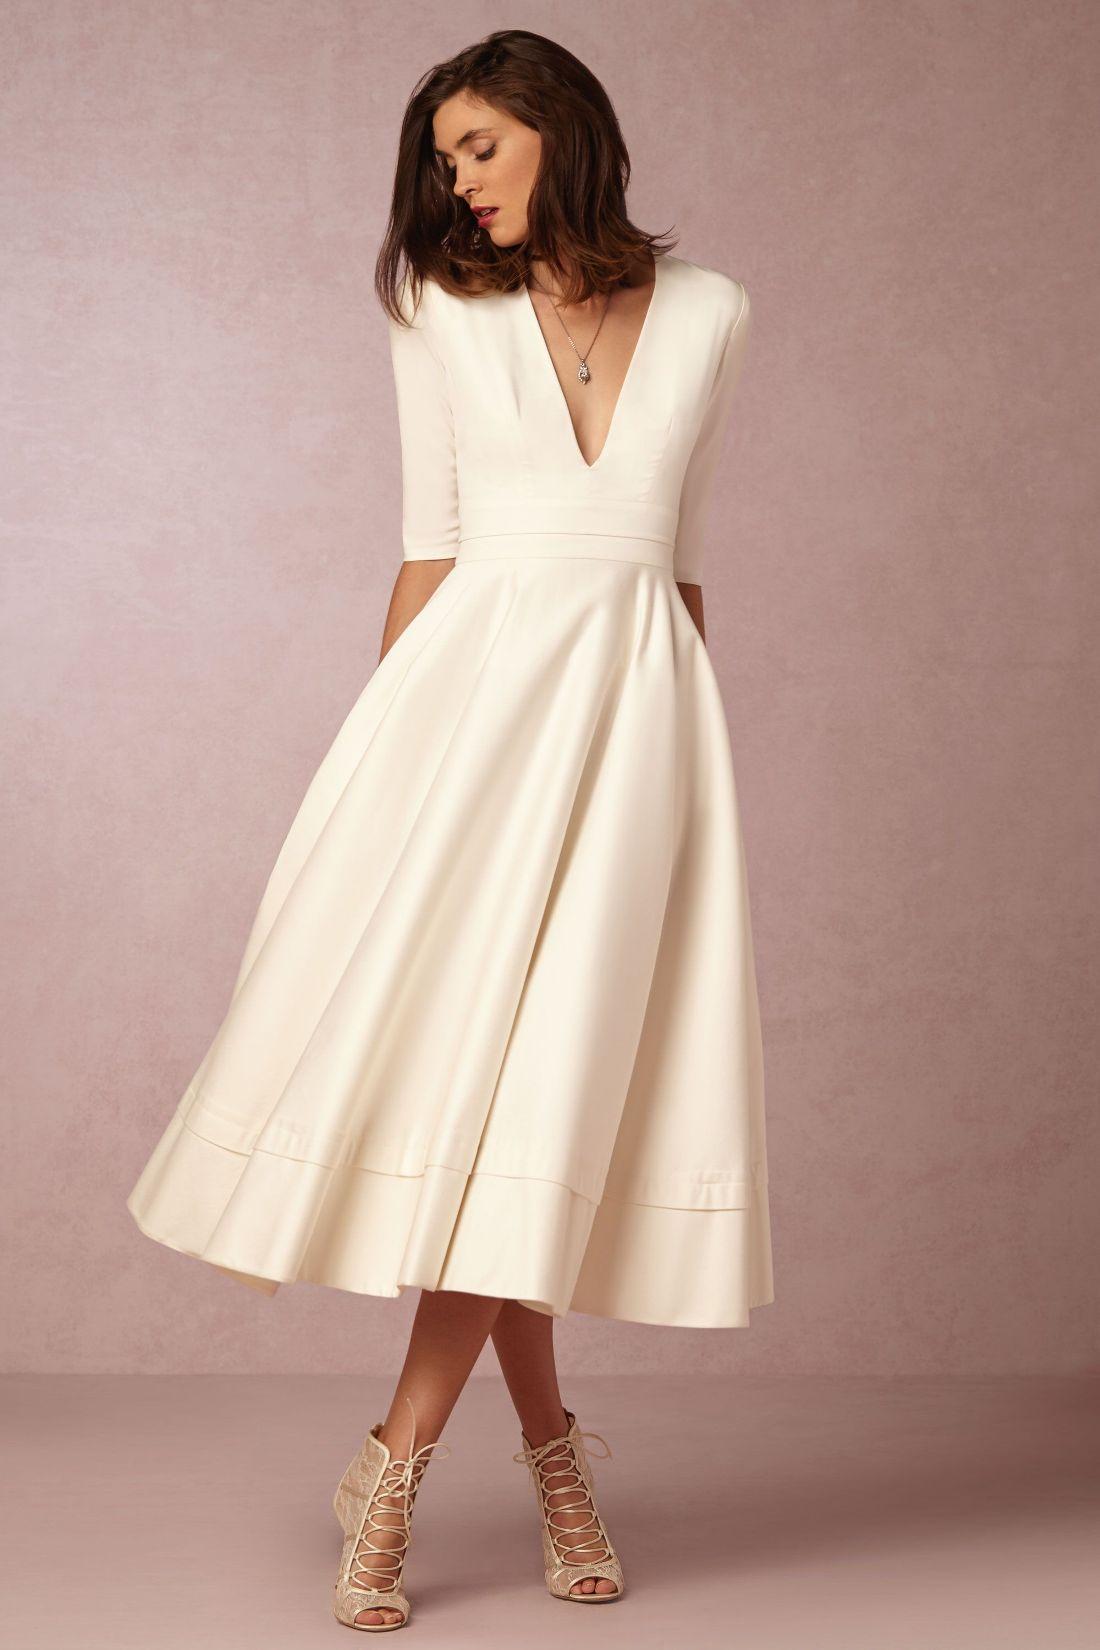 Informal Casual Wedding Dresses